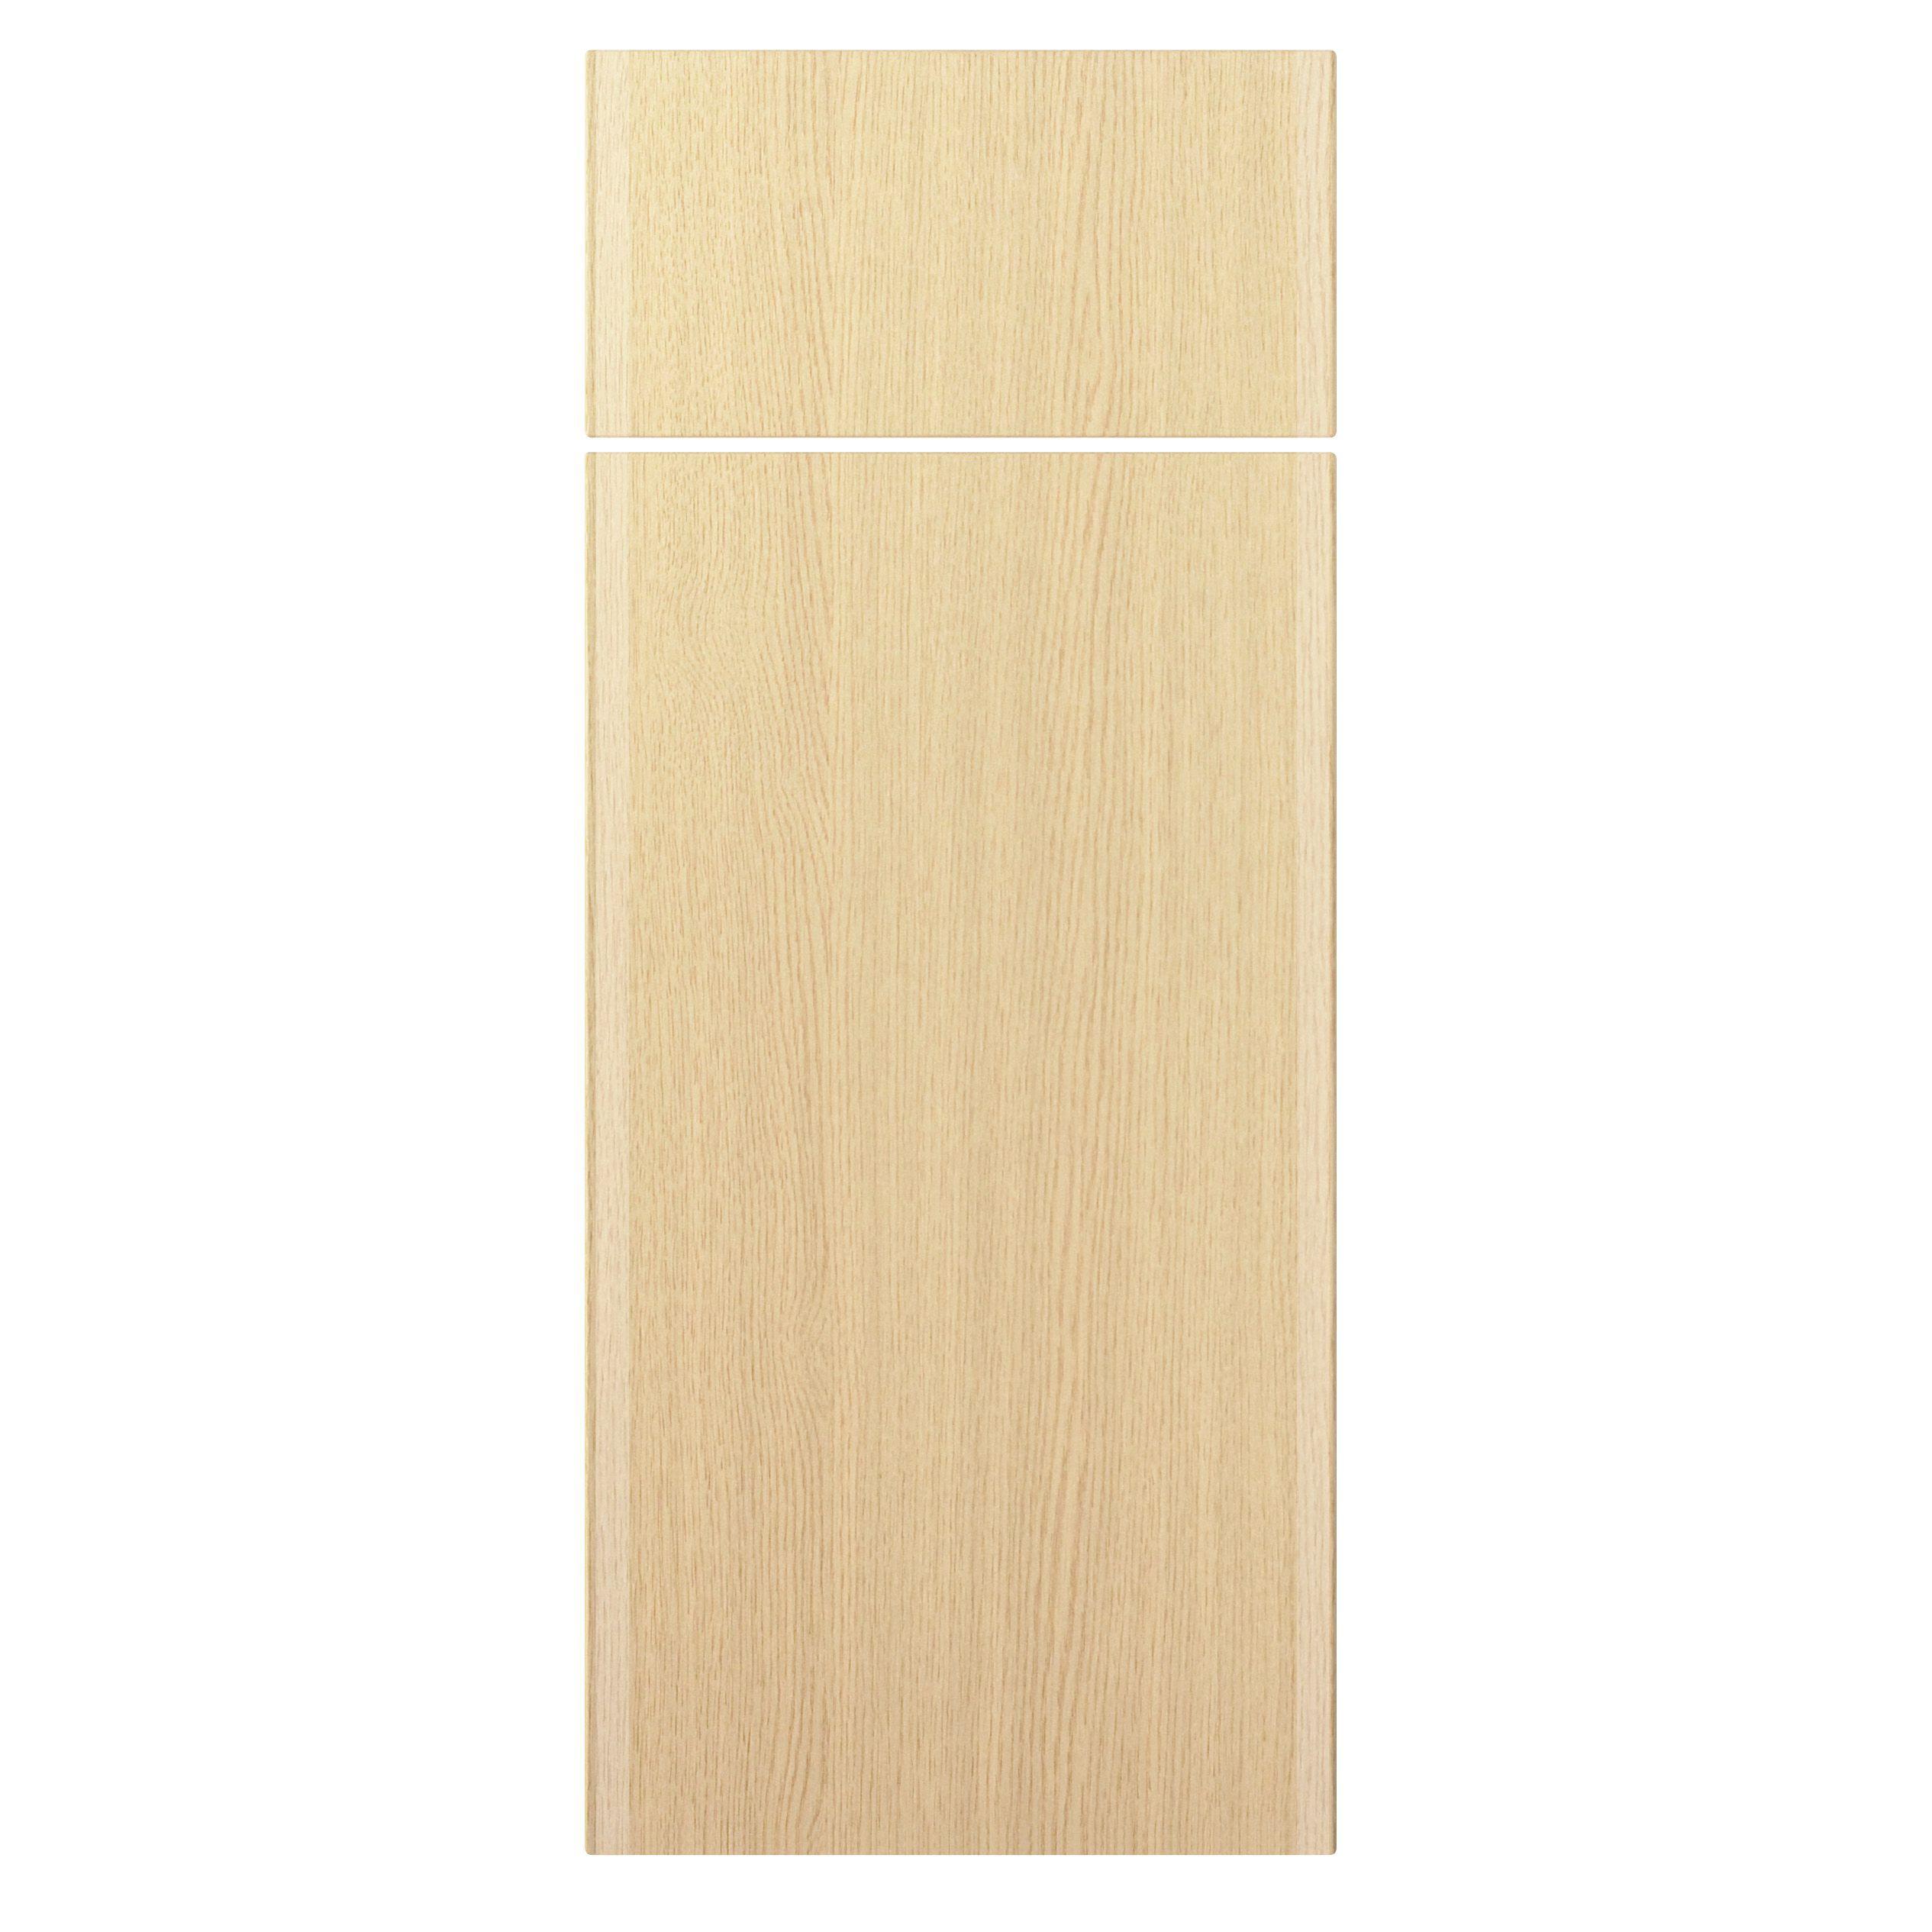 Textured Oak Effect Slab Kitchen Doors